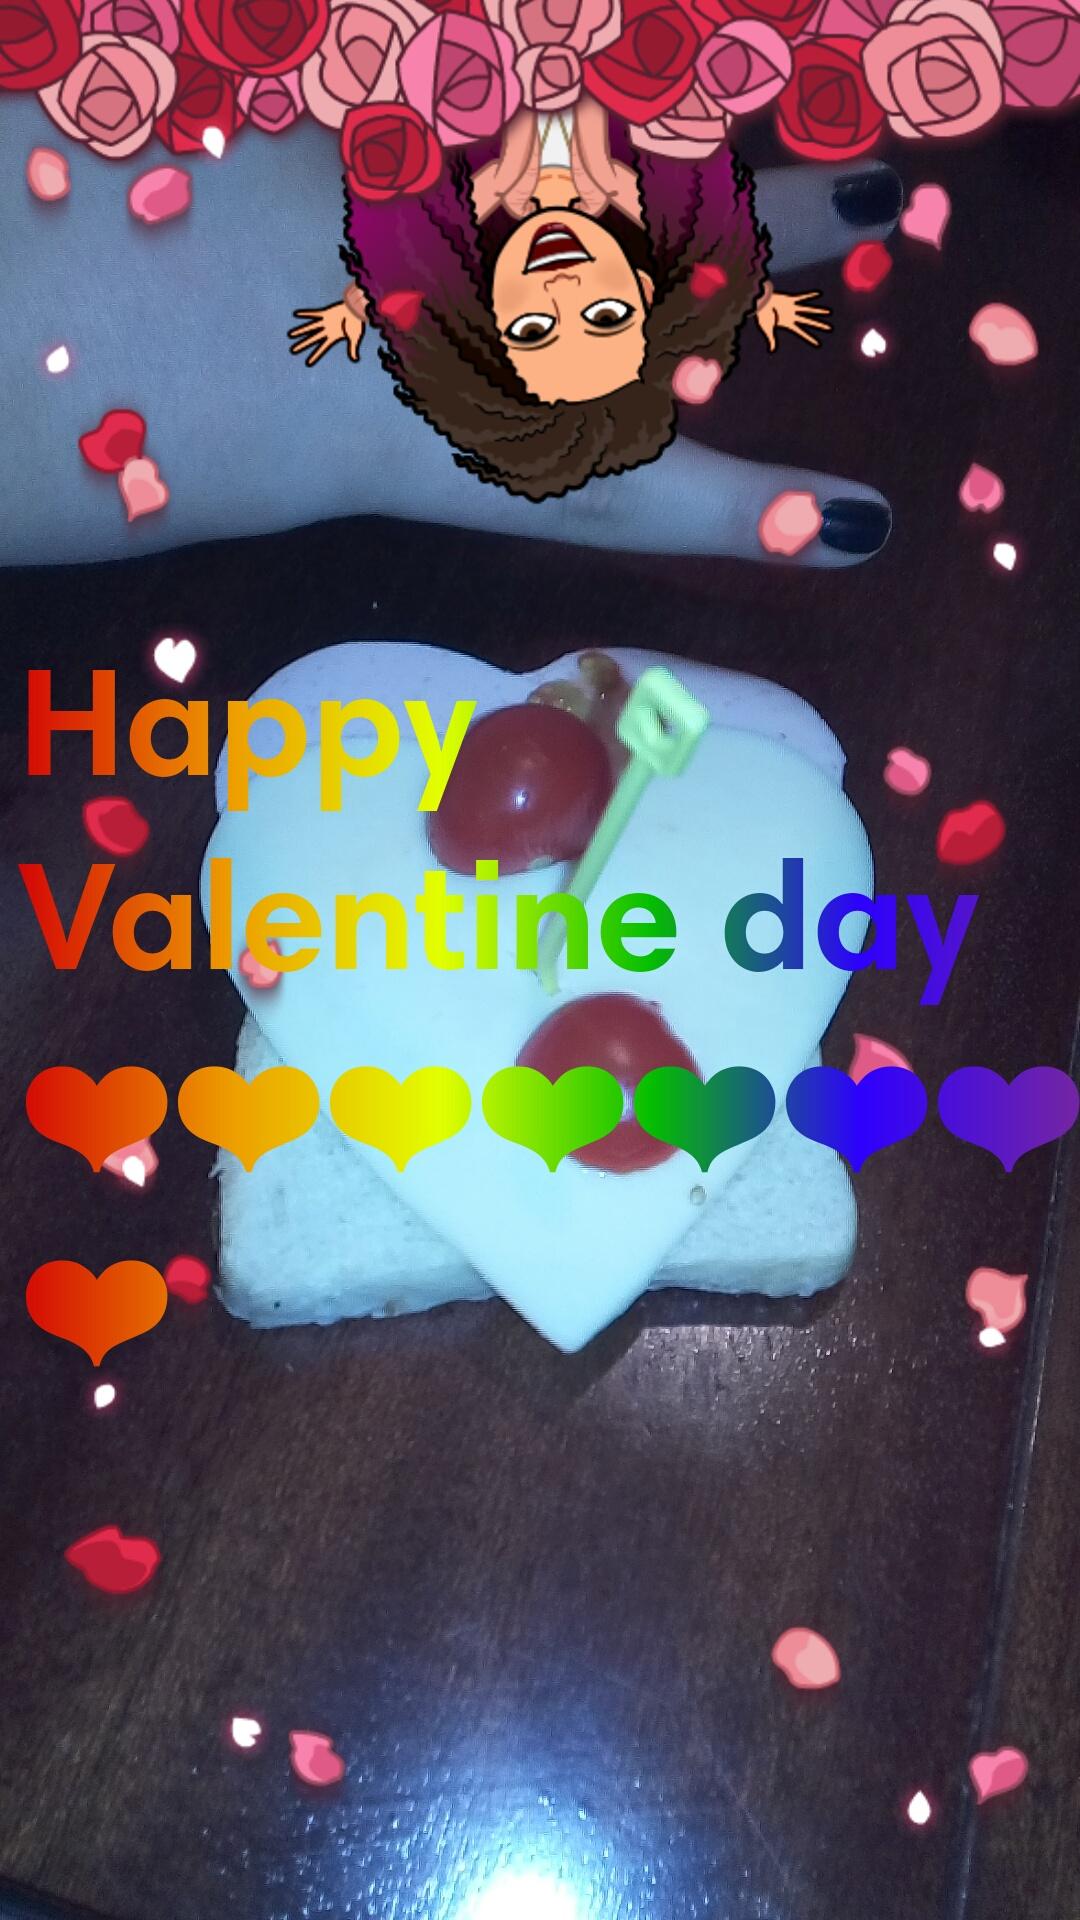 Happy Valentine day ❤❤❤❤❤❤